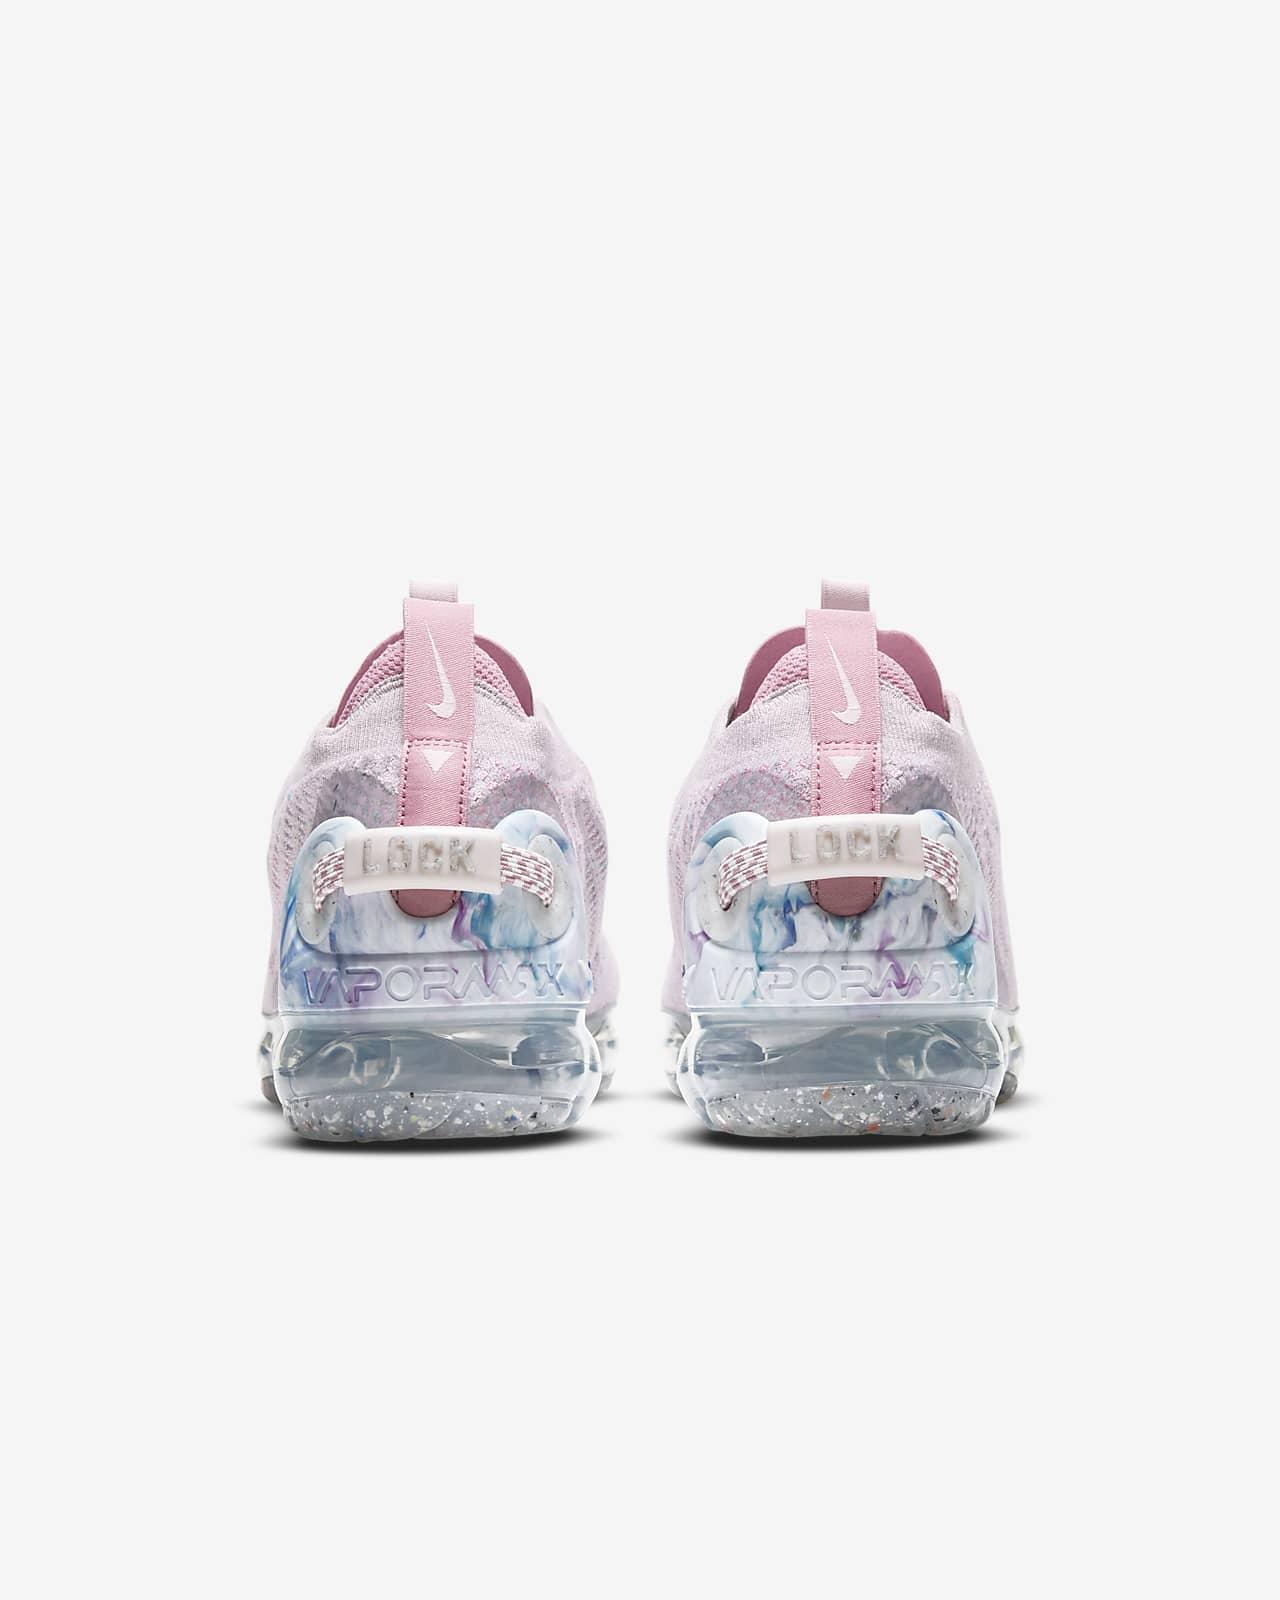 Chaussure Nike Air Vapormax 2020 Flyknit pour Femme. Nike LU